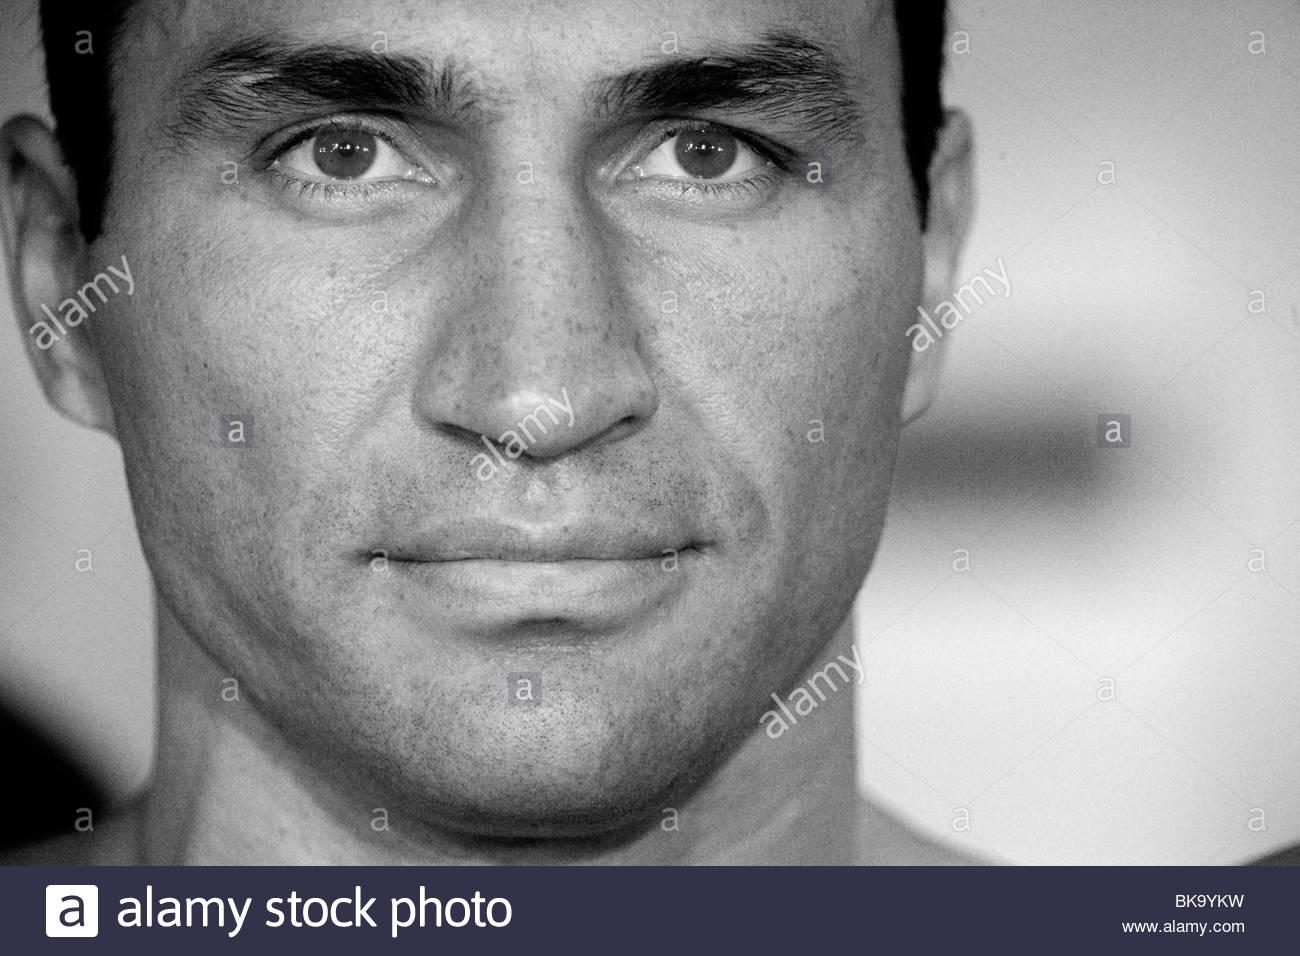 Vladimir Klitschko - Stock Image